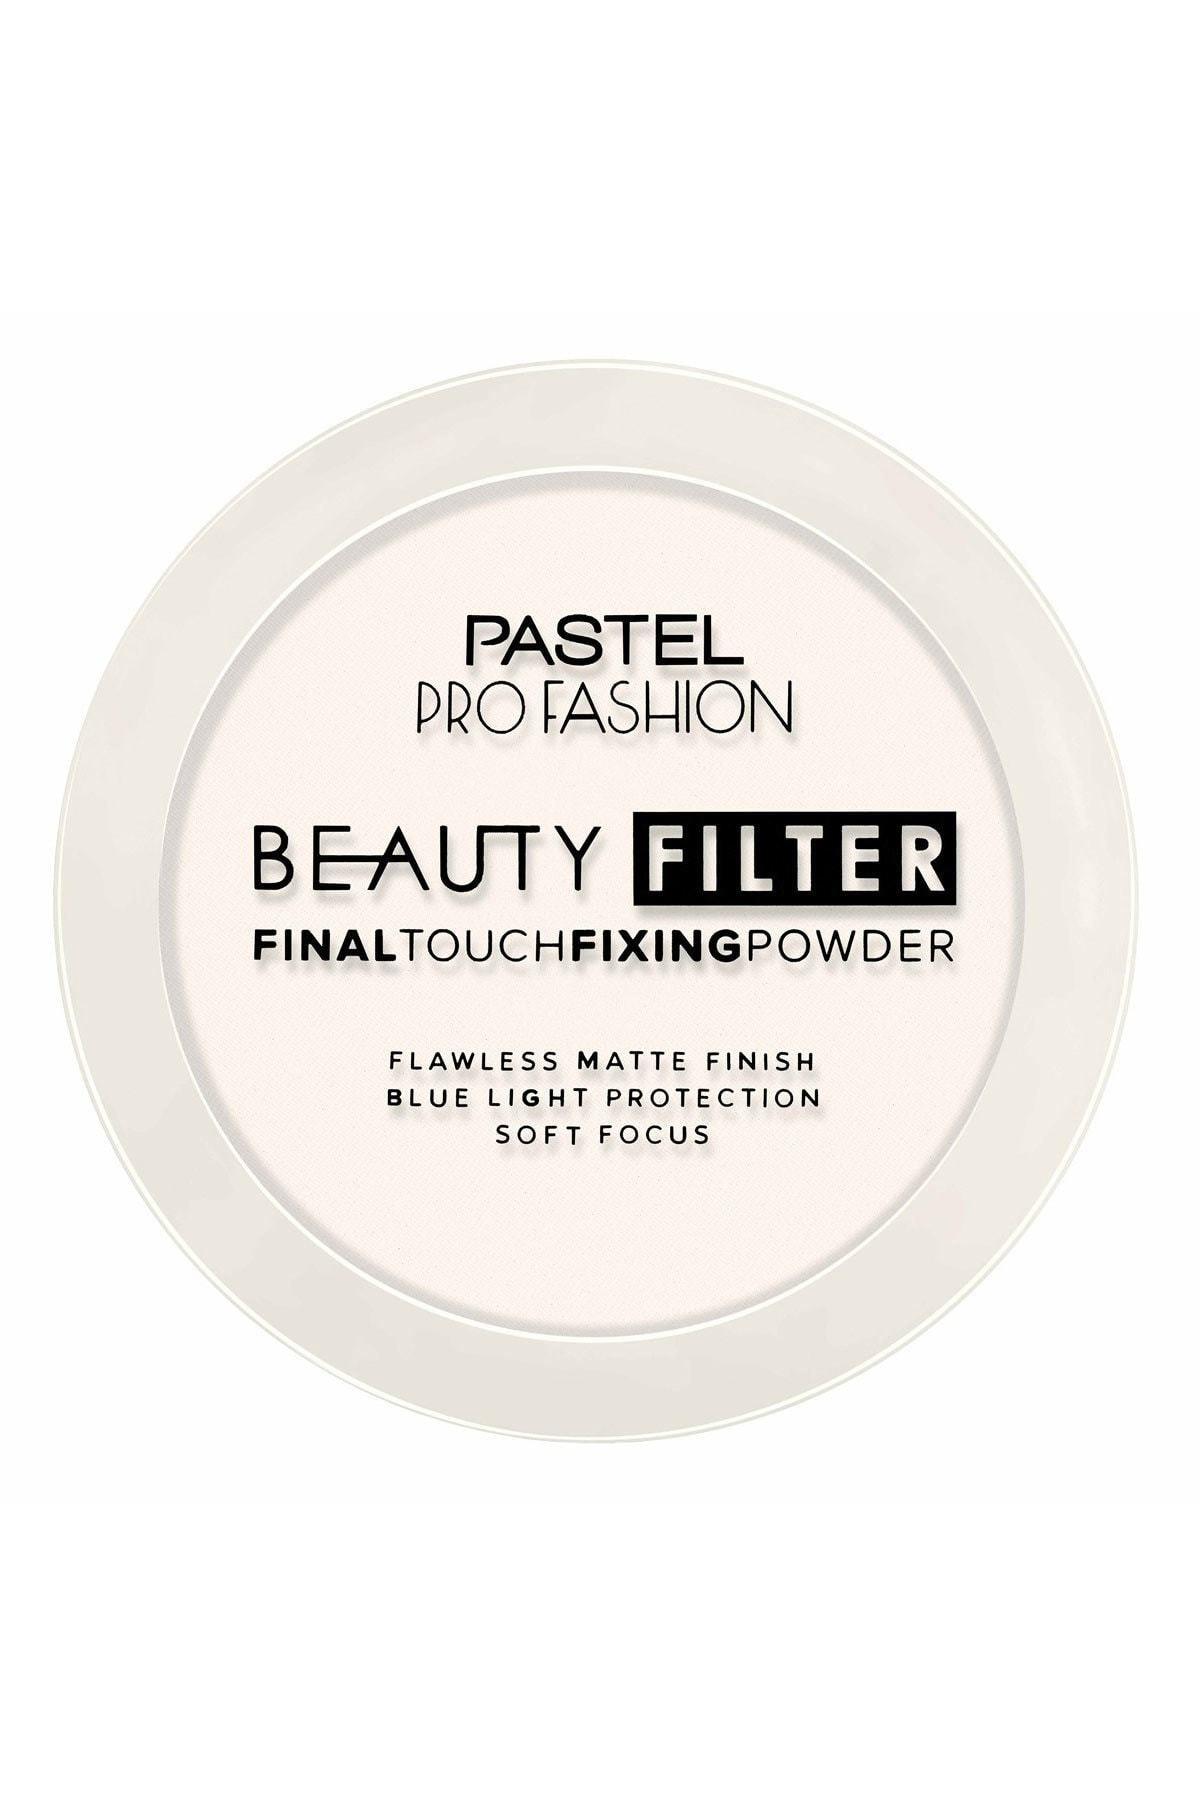 Pastel Sabitleyici Pudra - Profashion Final Touch Fixing Powder No 00 8690644030703 1